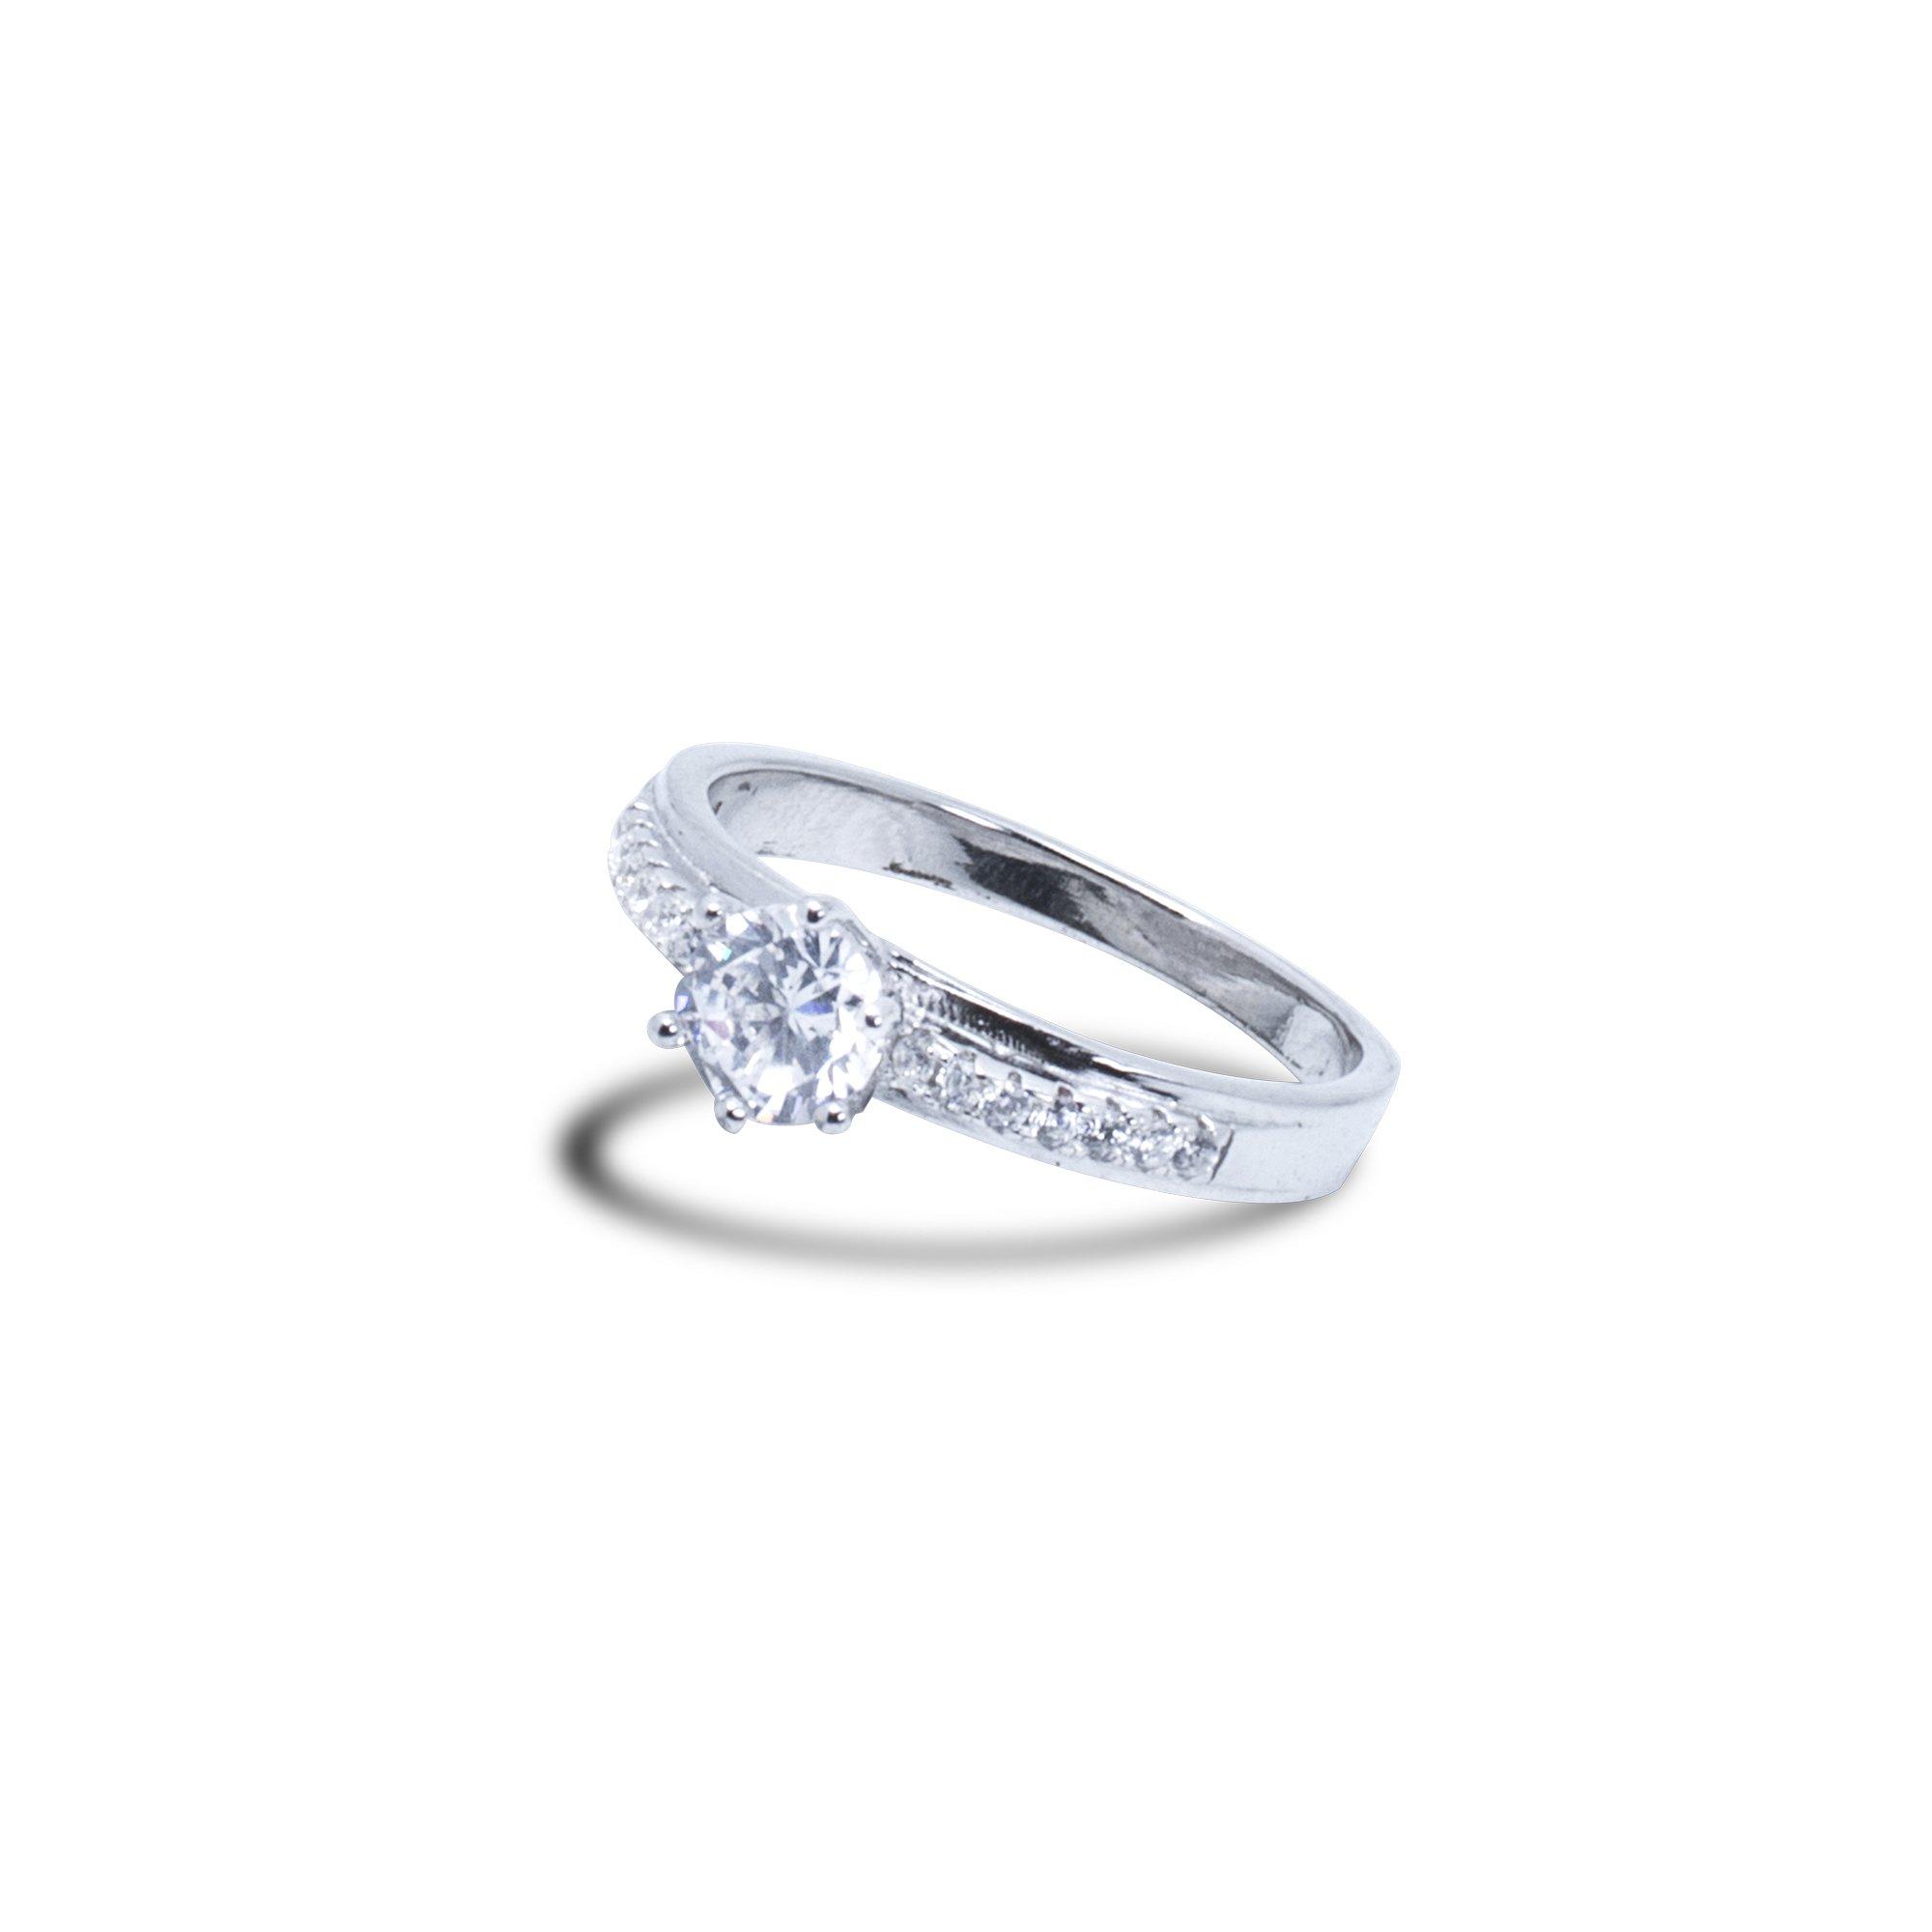 Silver Prism Ring